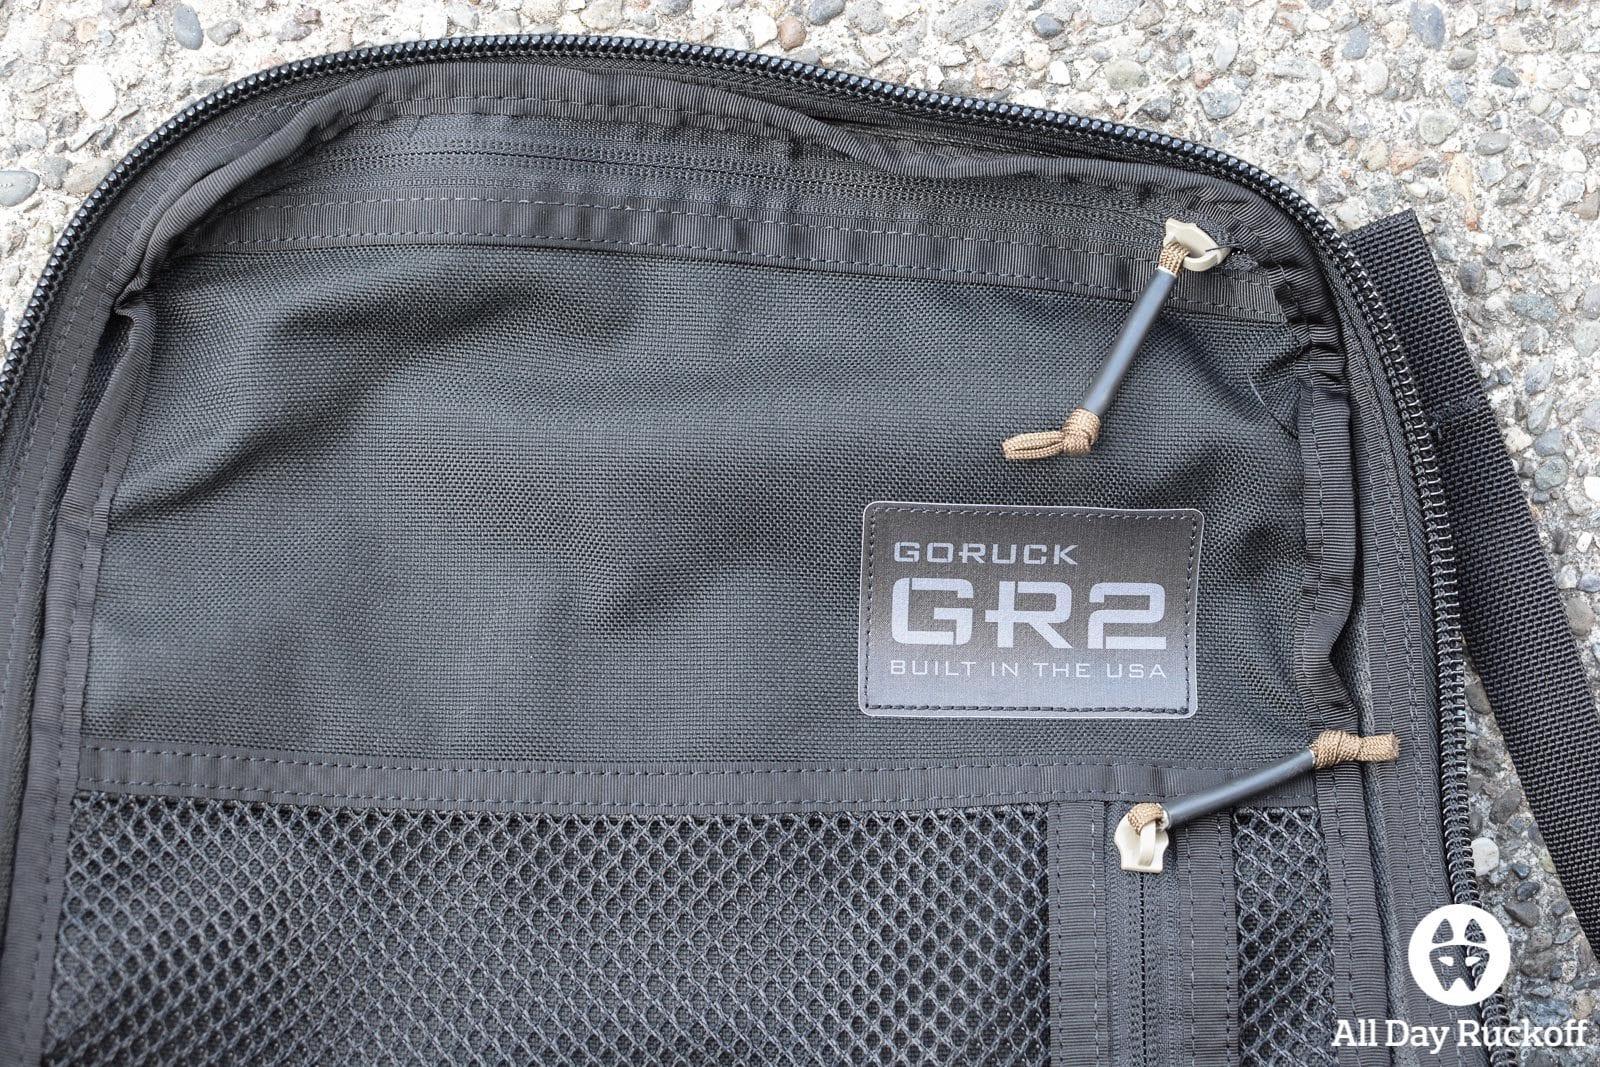 GORUCK GR2 34L - Label